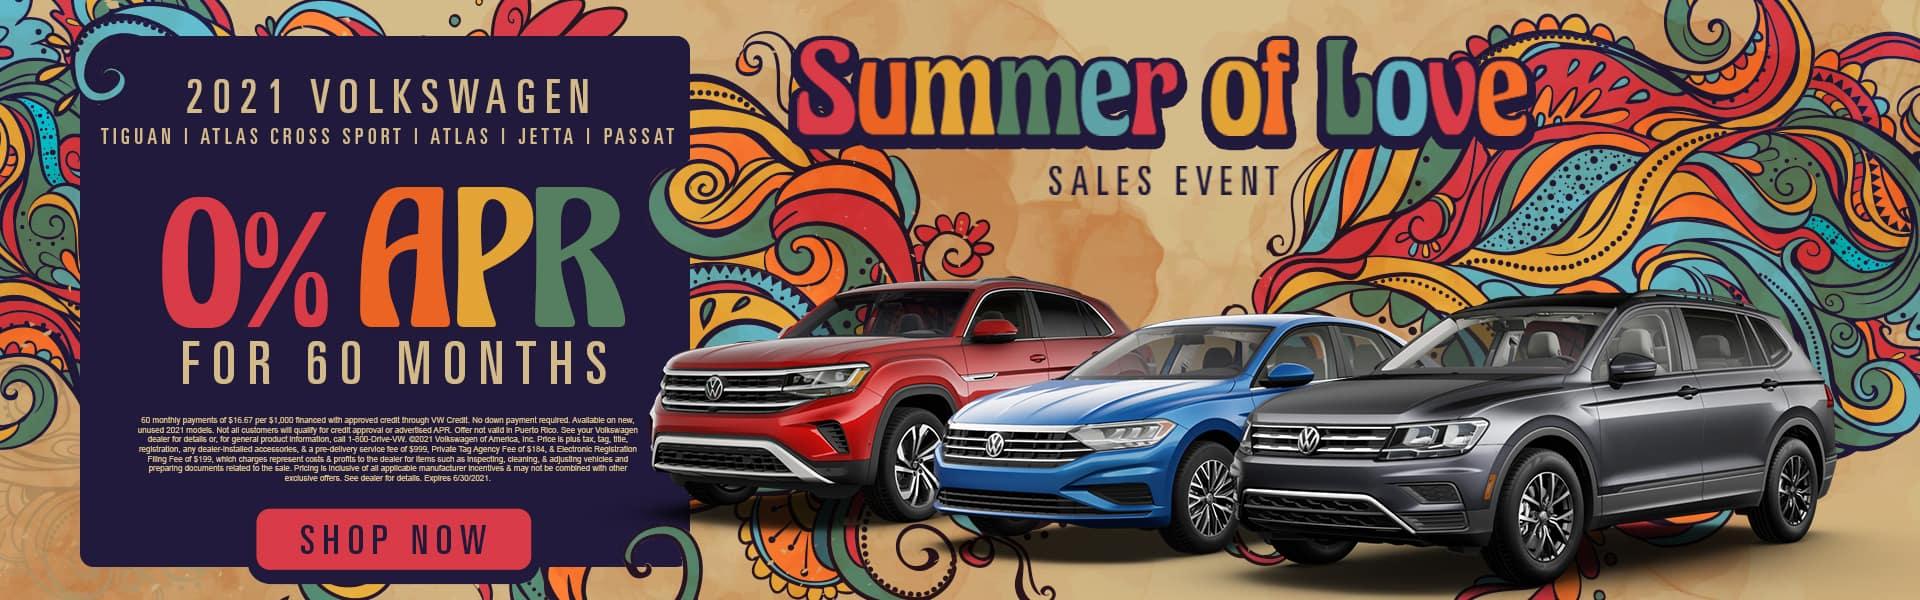 Summer of Love | 2021 Volkswagen Tiguan, Atlas Cross Sport, Atlas, Jetta, Passat | 0% APR For 60 Months